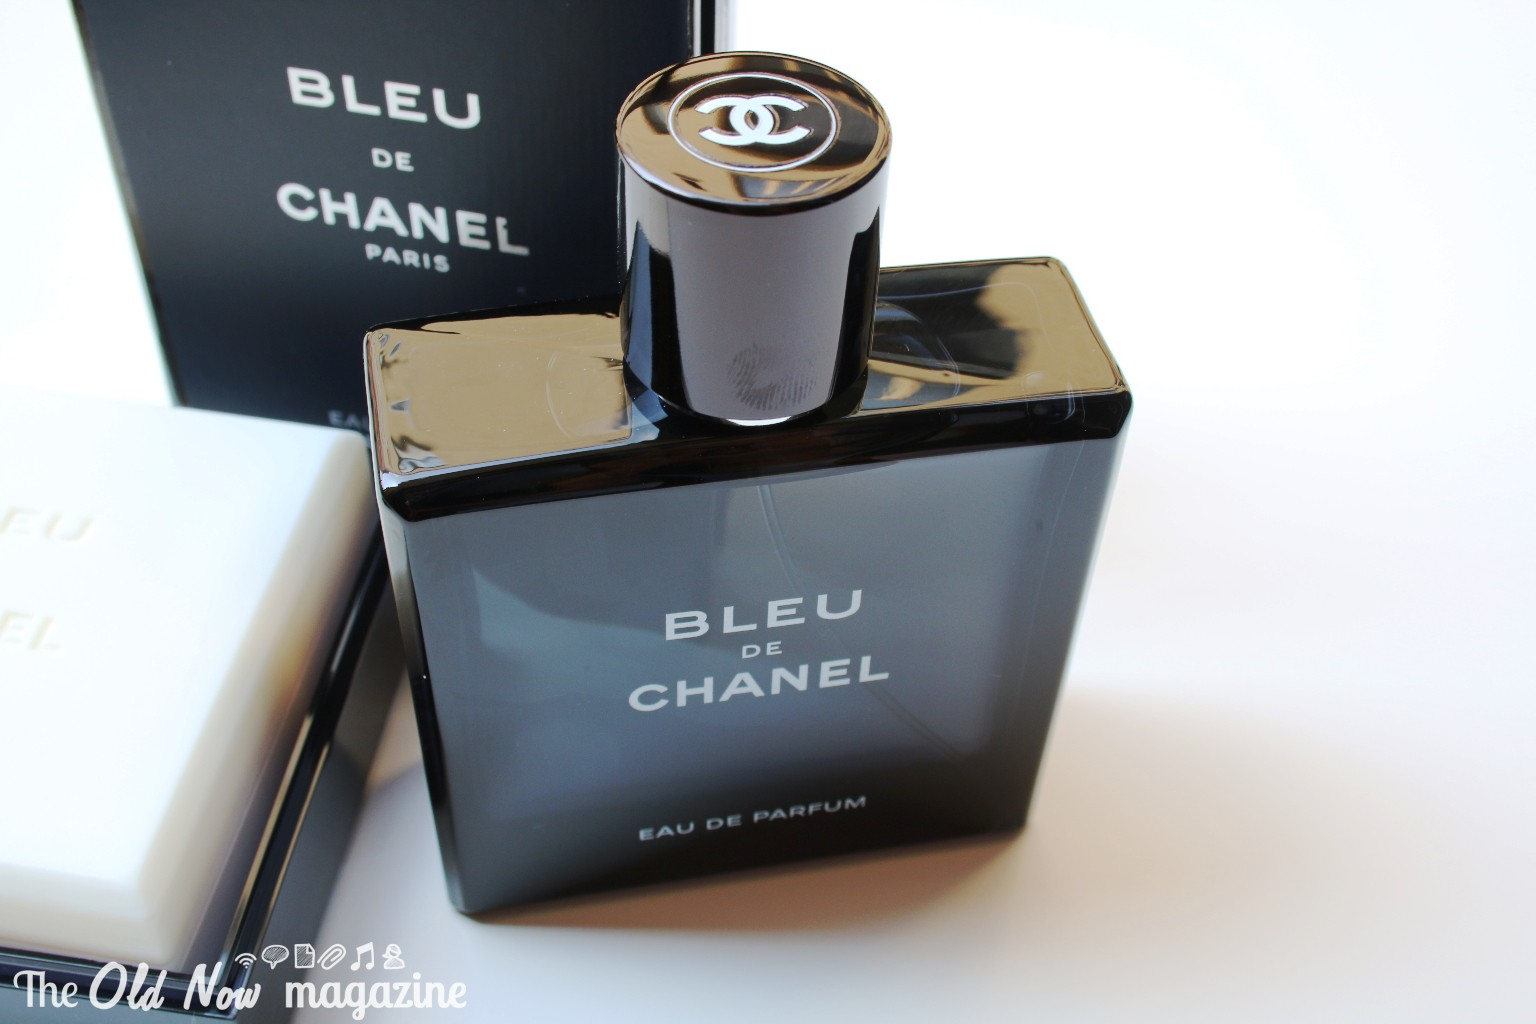 Bleu de Chanel CHANEL THEOLDNOW (6)